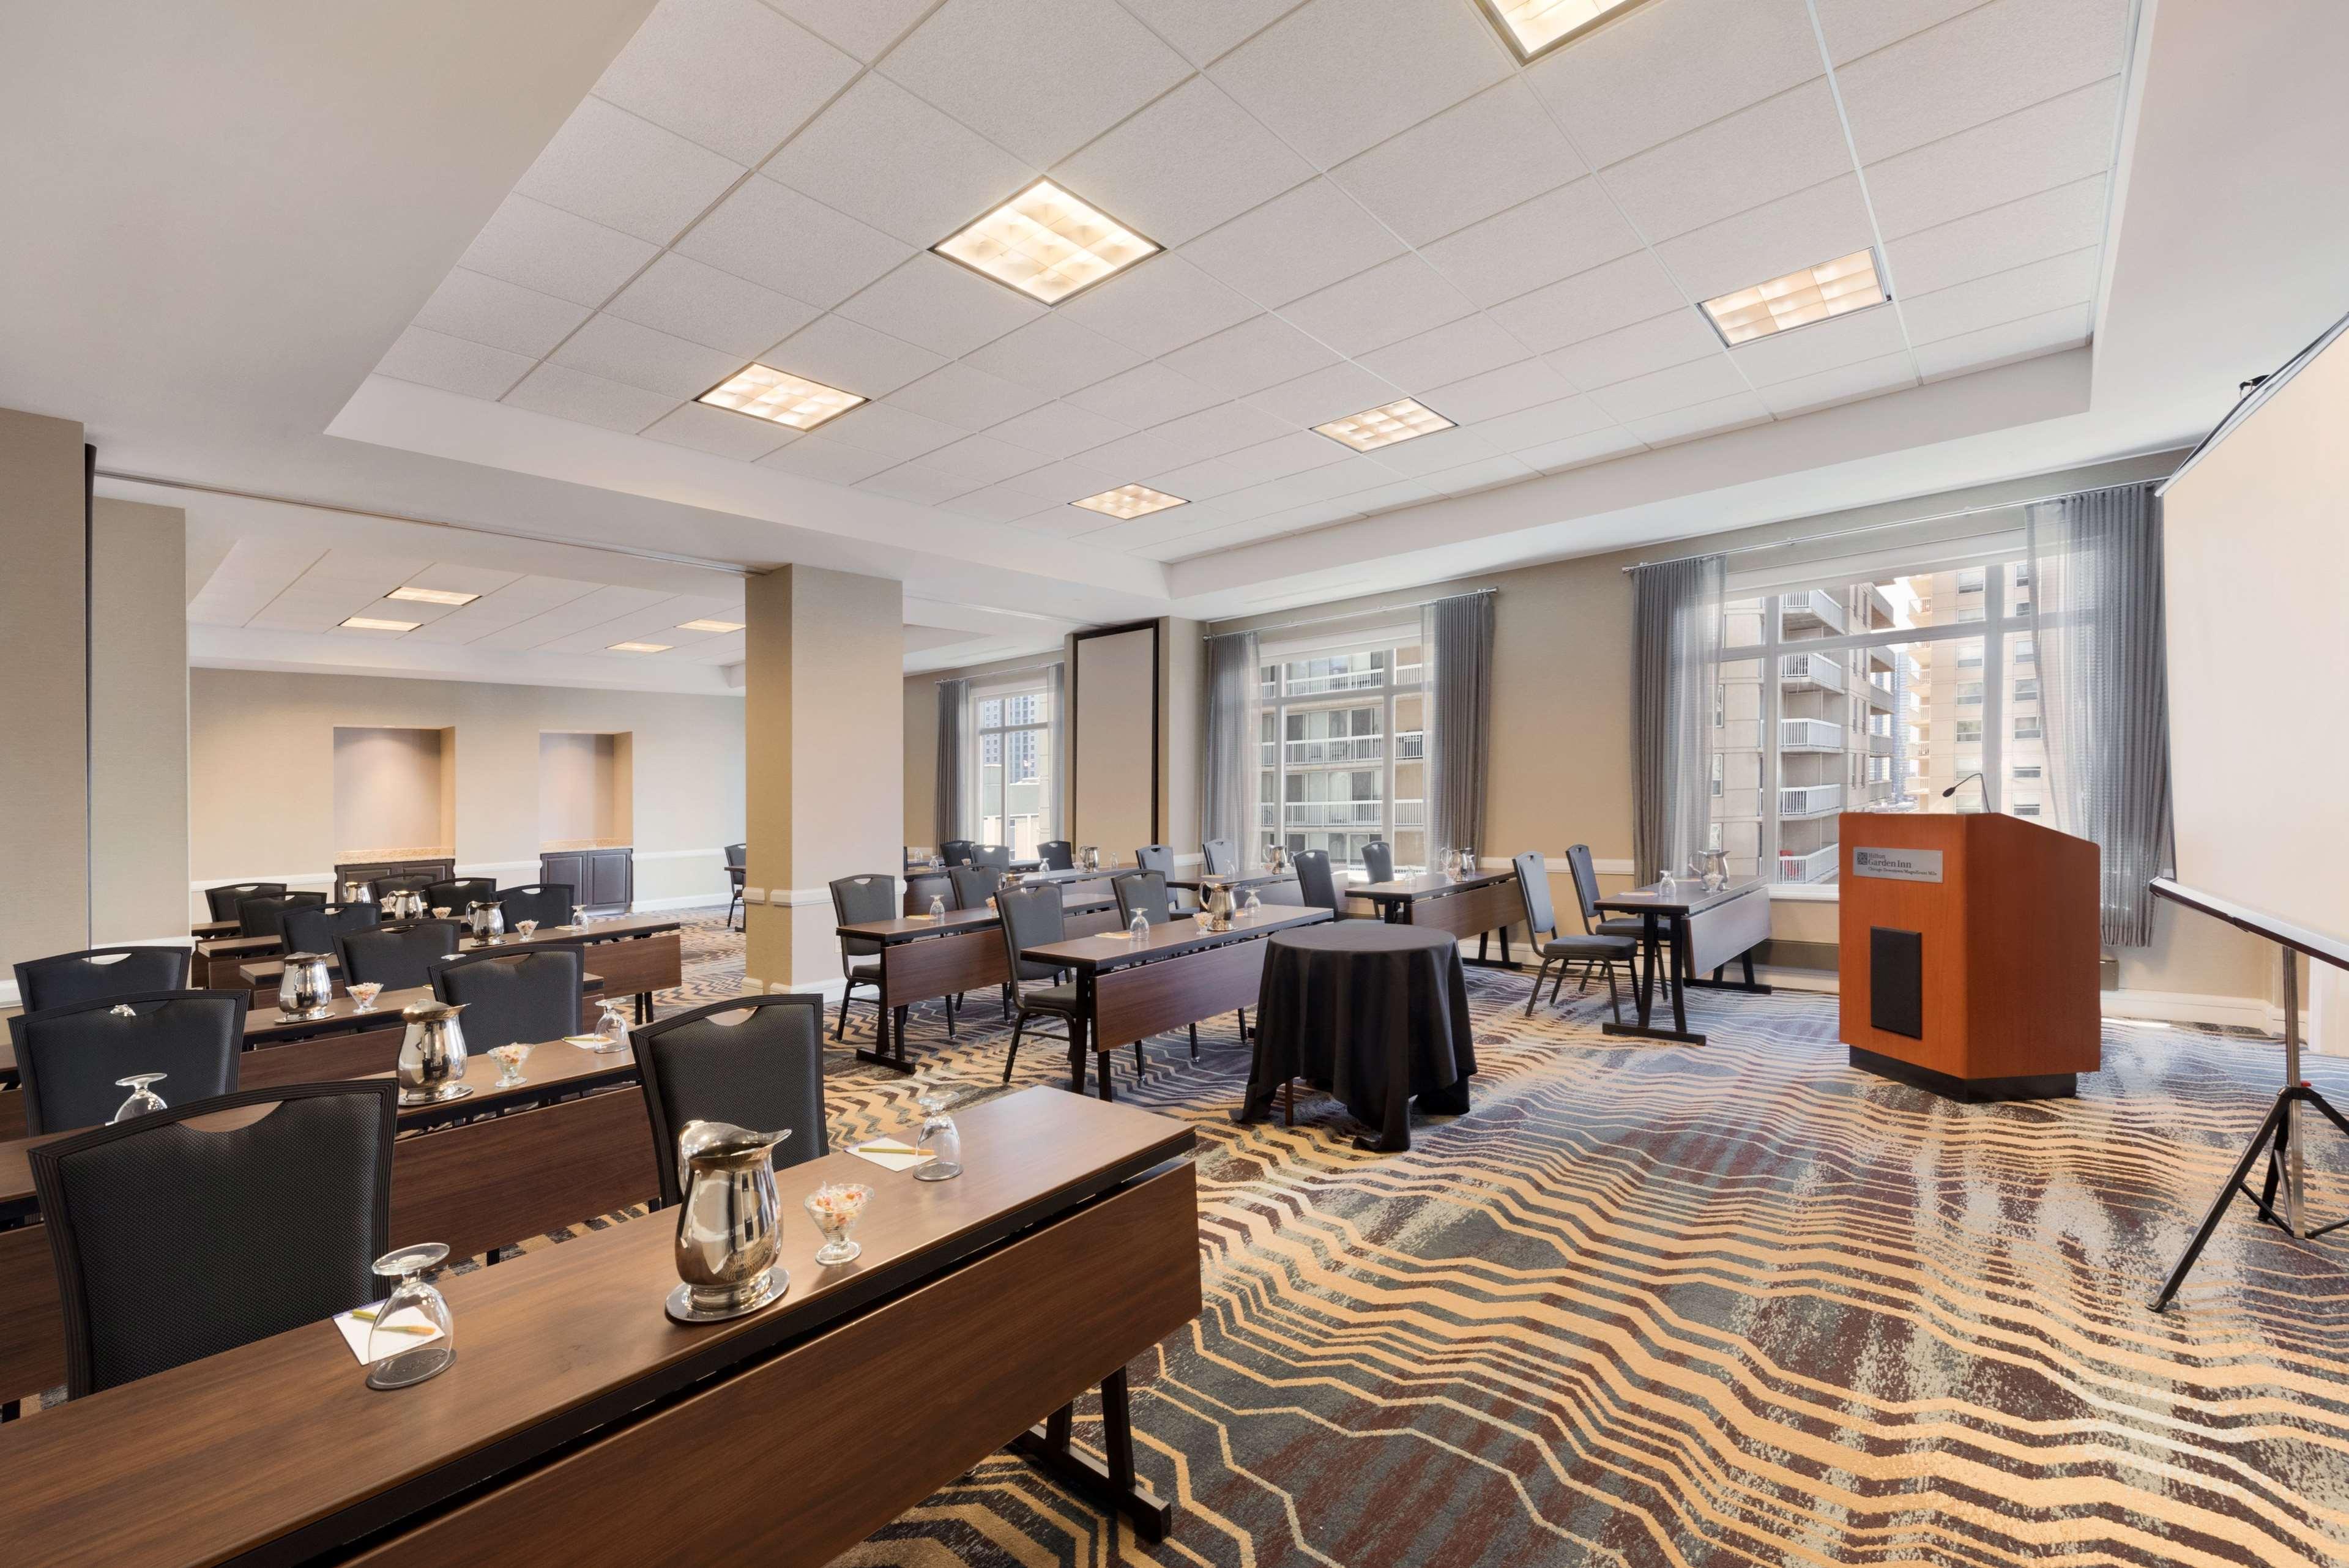 Hilton Garden Inn Chicago Downtown/Magnificent Mile image 48